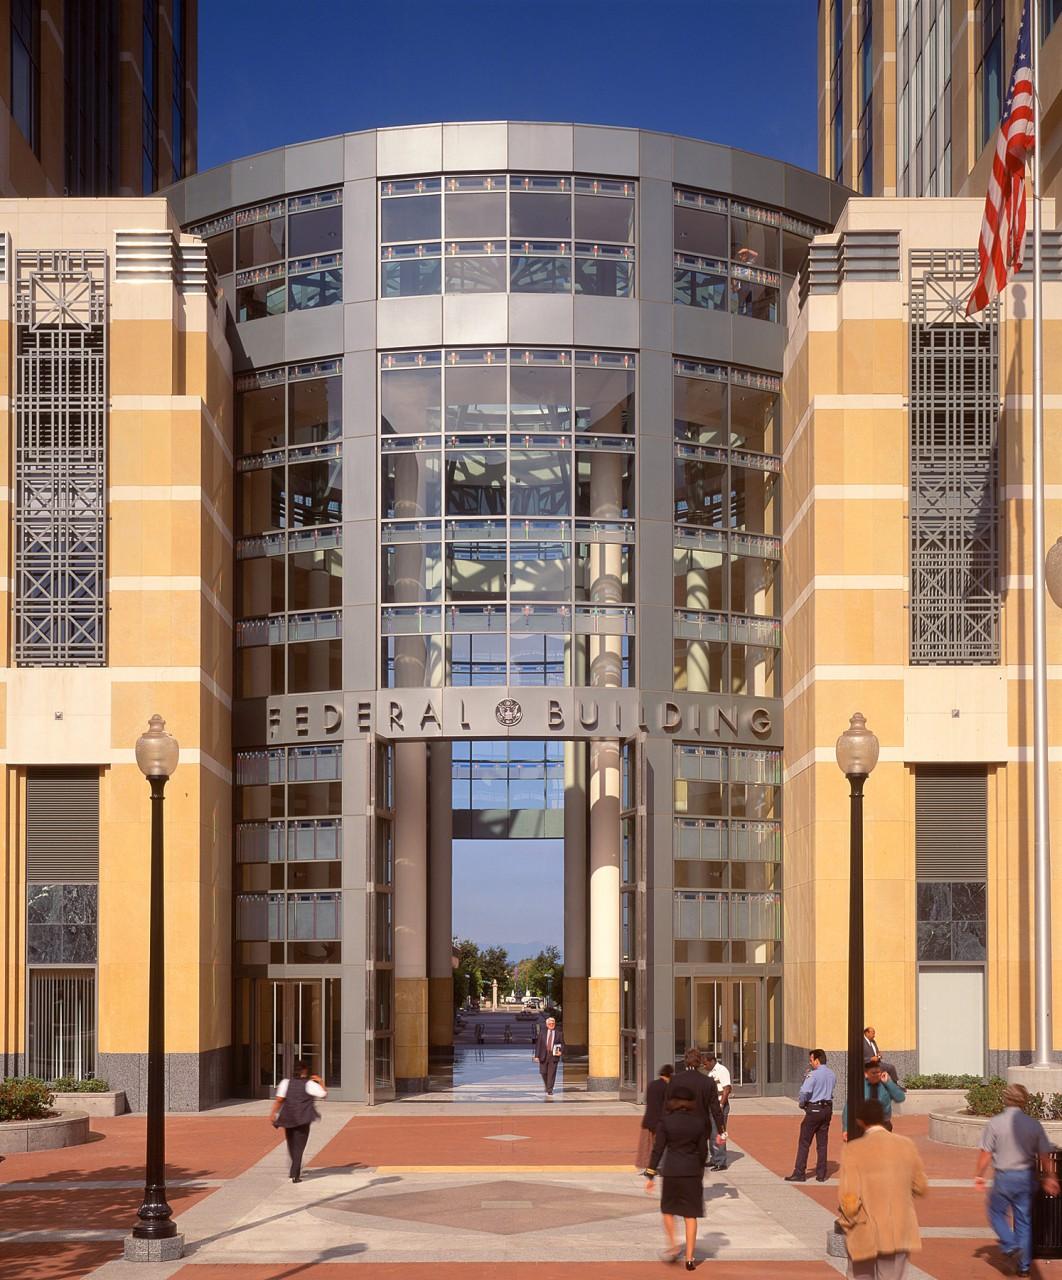 Oakland Federal Building, Oakland, California / image 1